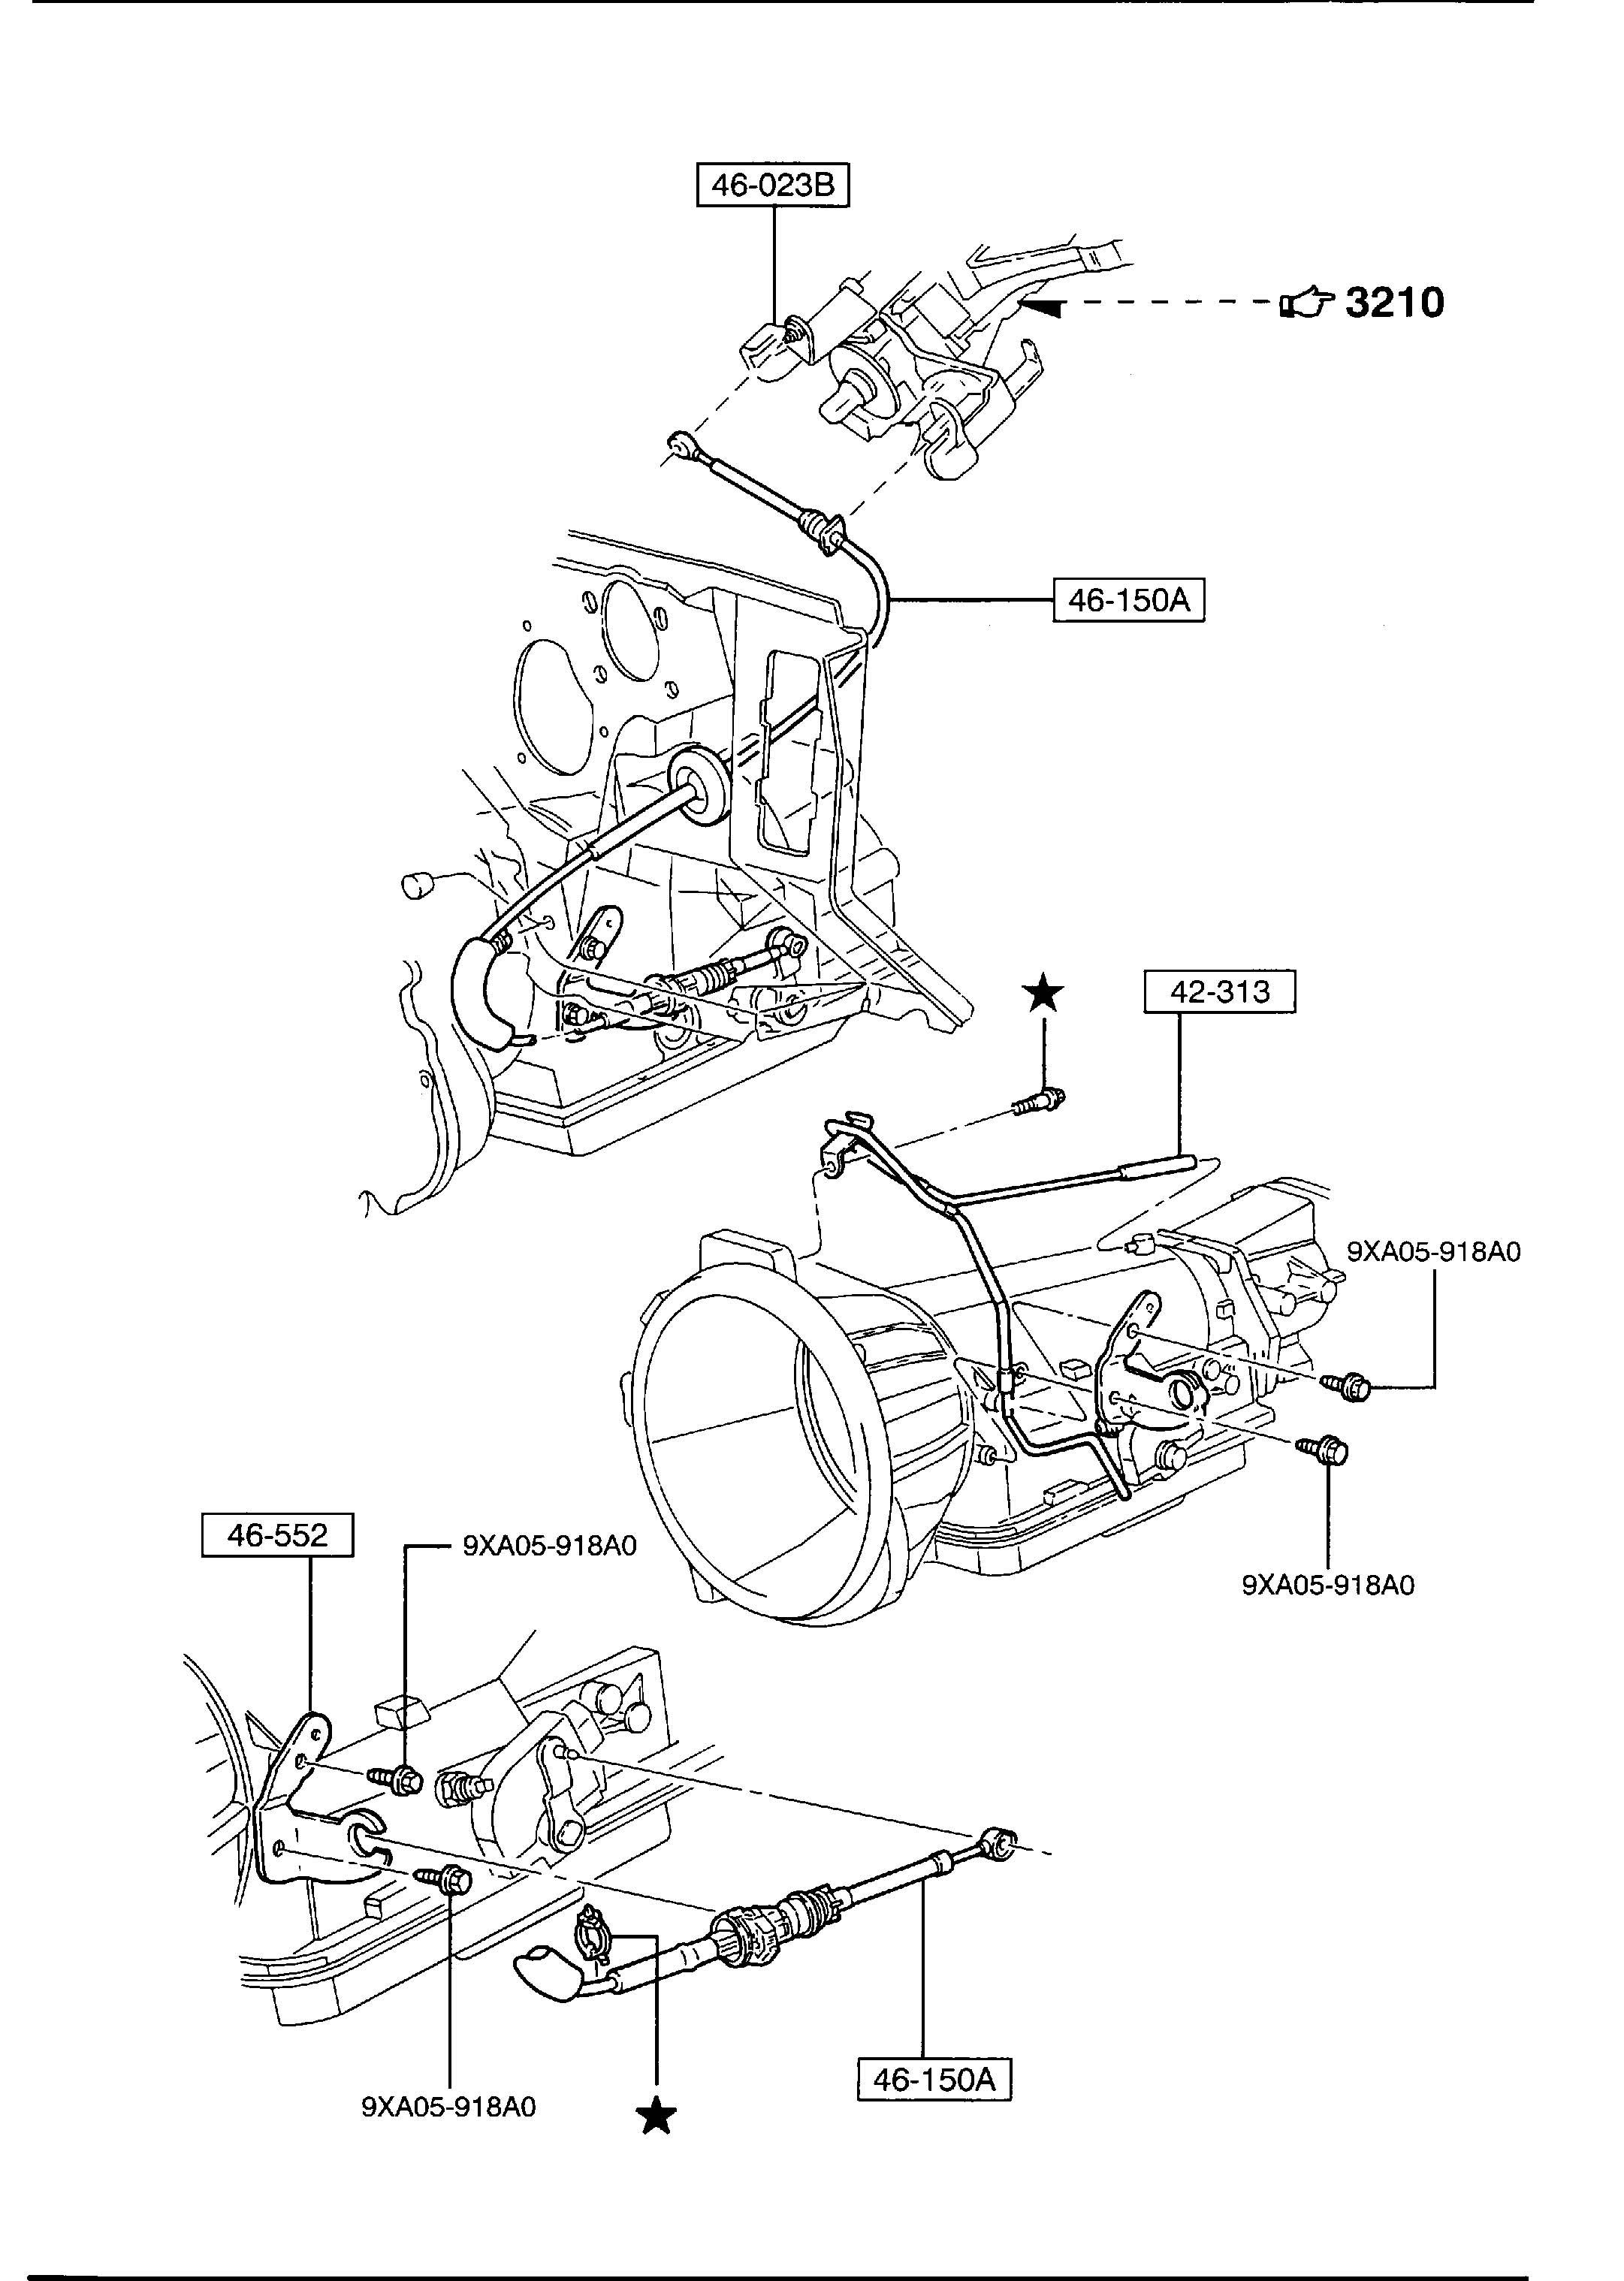 tags: #2010 ford fusion parts diagram#2010 ford fusion fuse panel diagram#2010  ford fusion brake caliper#2010 ford fusion fuse box diagram#2010 chevrolet